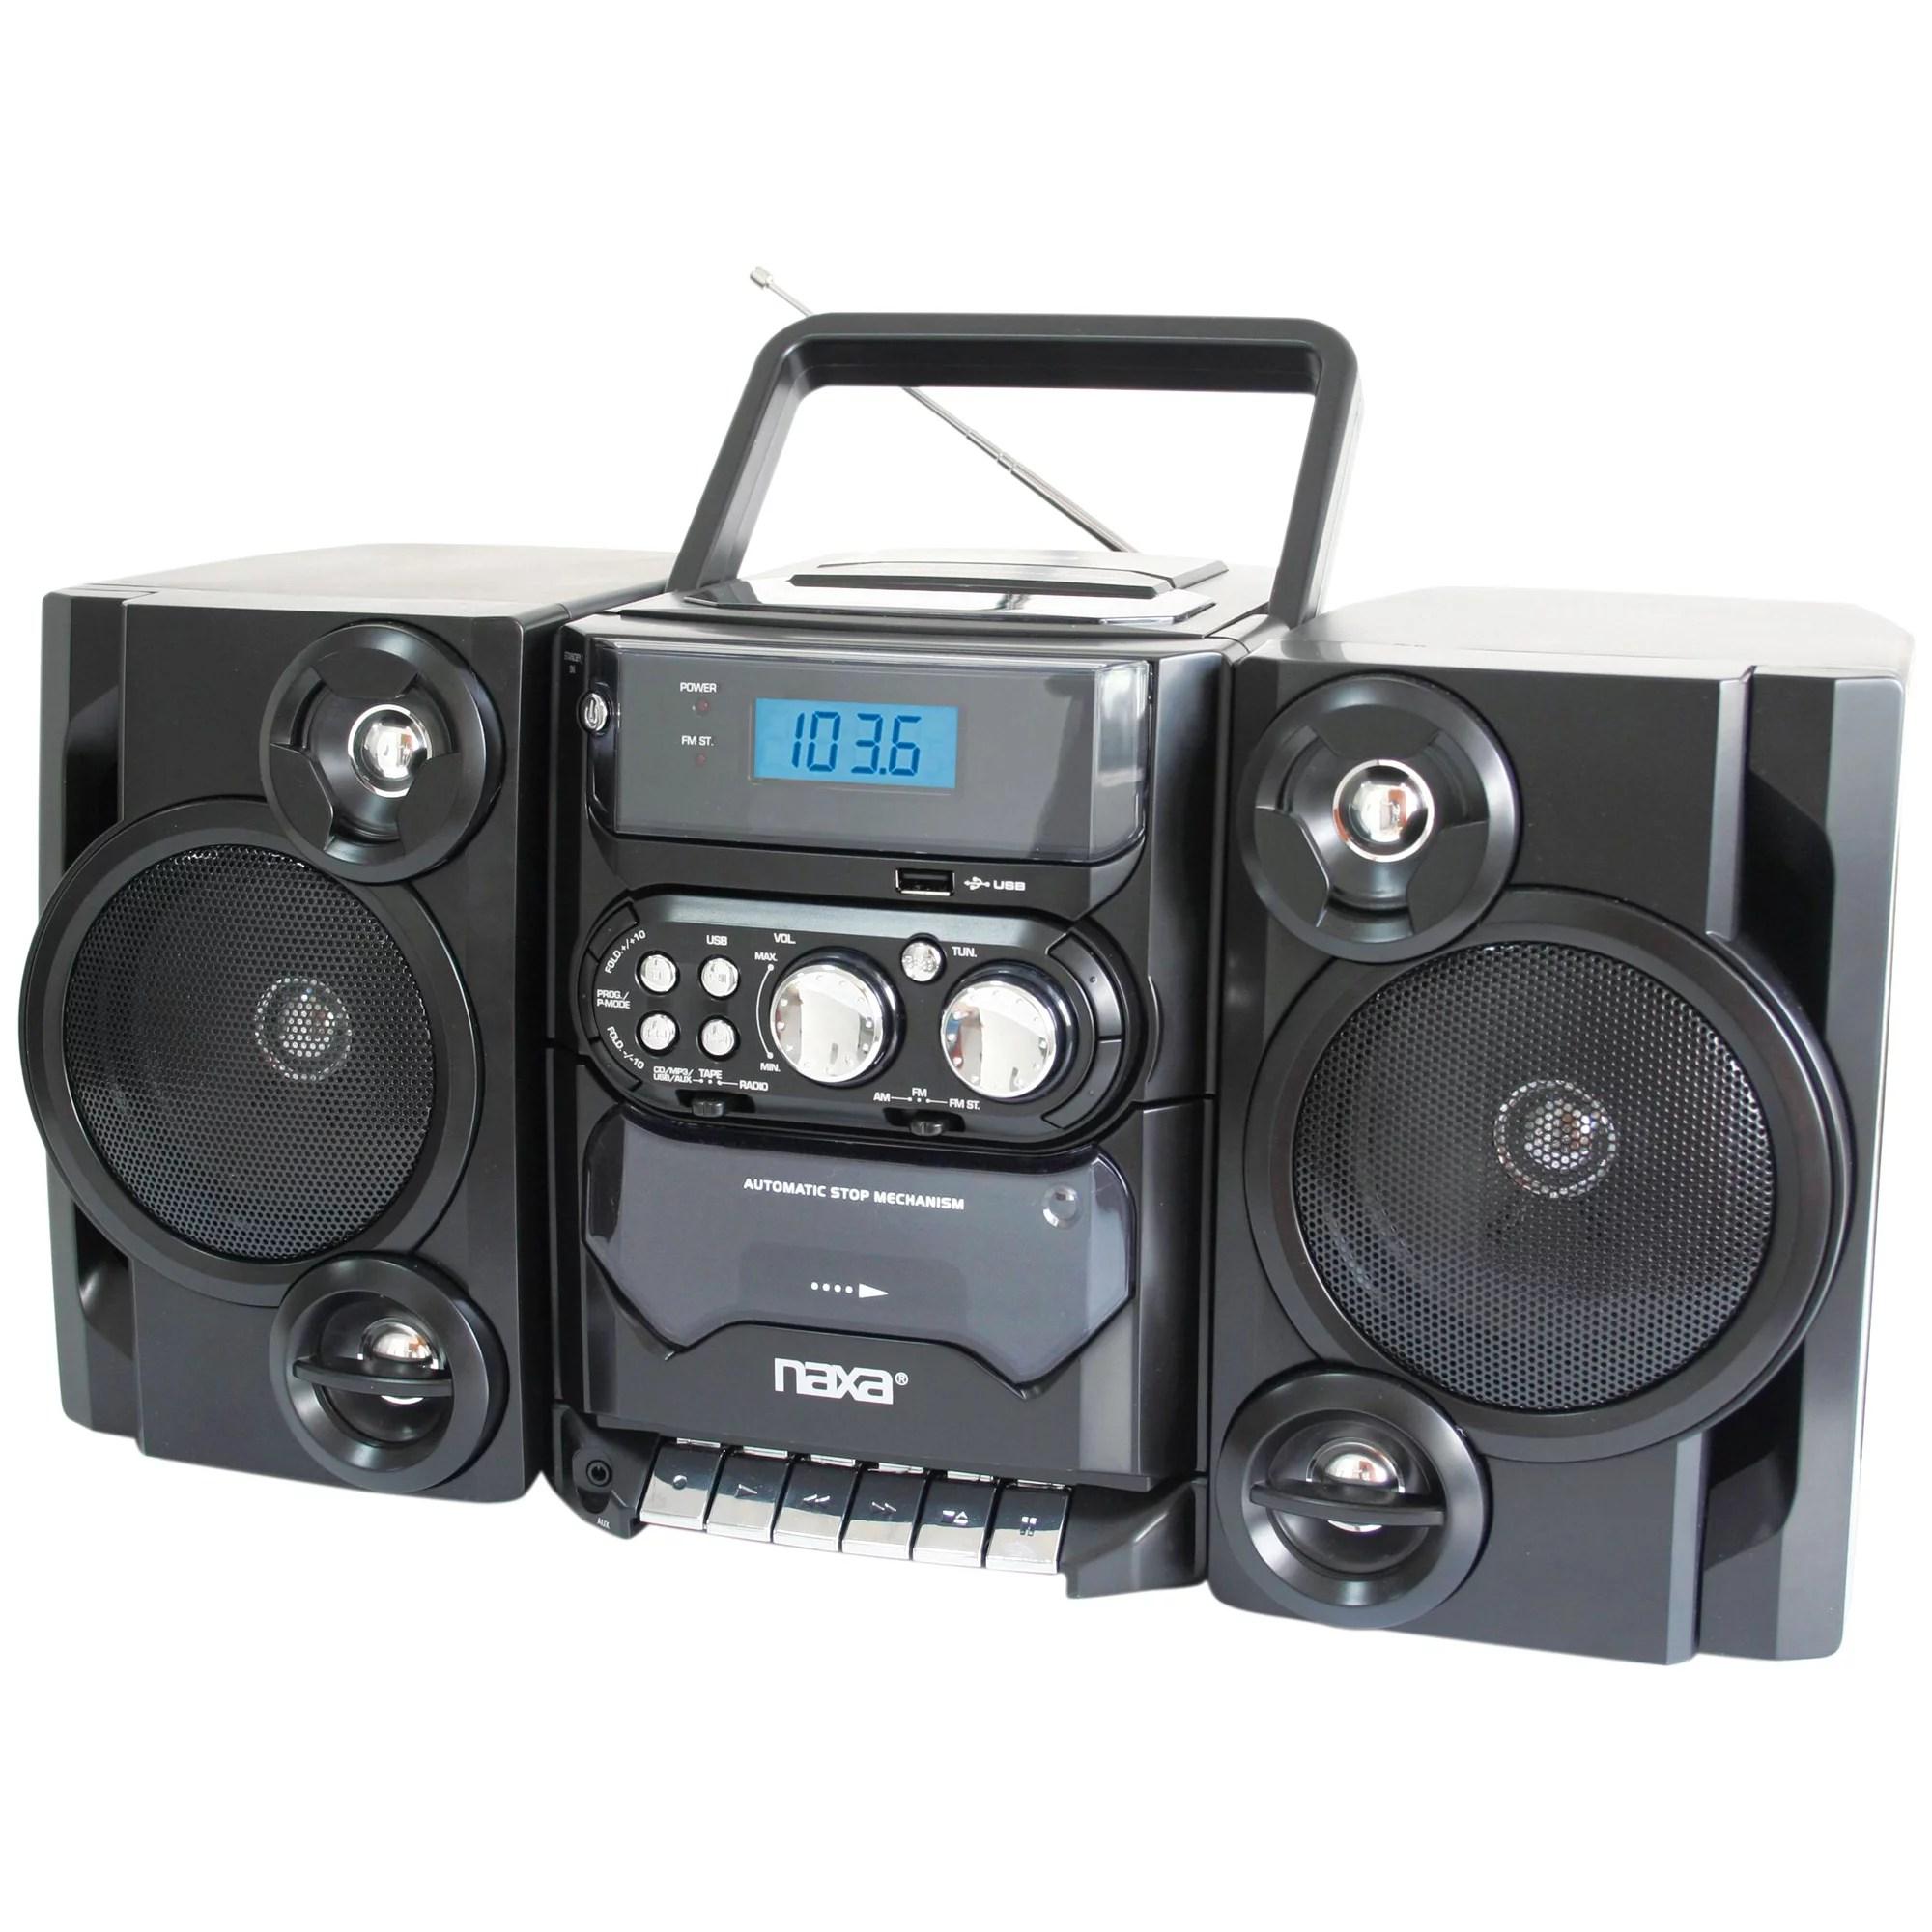 hight resolution of naxa npb428 portable cd mp3 player with am fm radio detachable speakers remote usb input walmart com